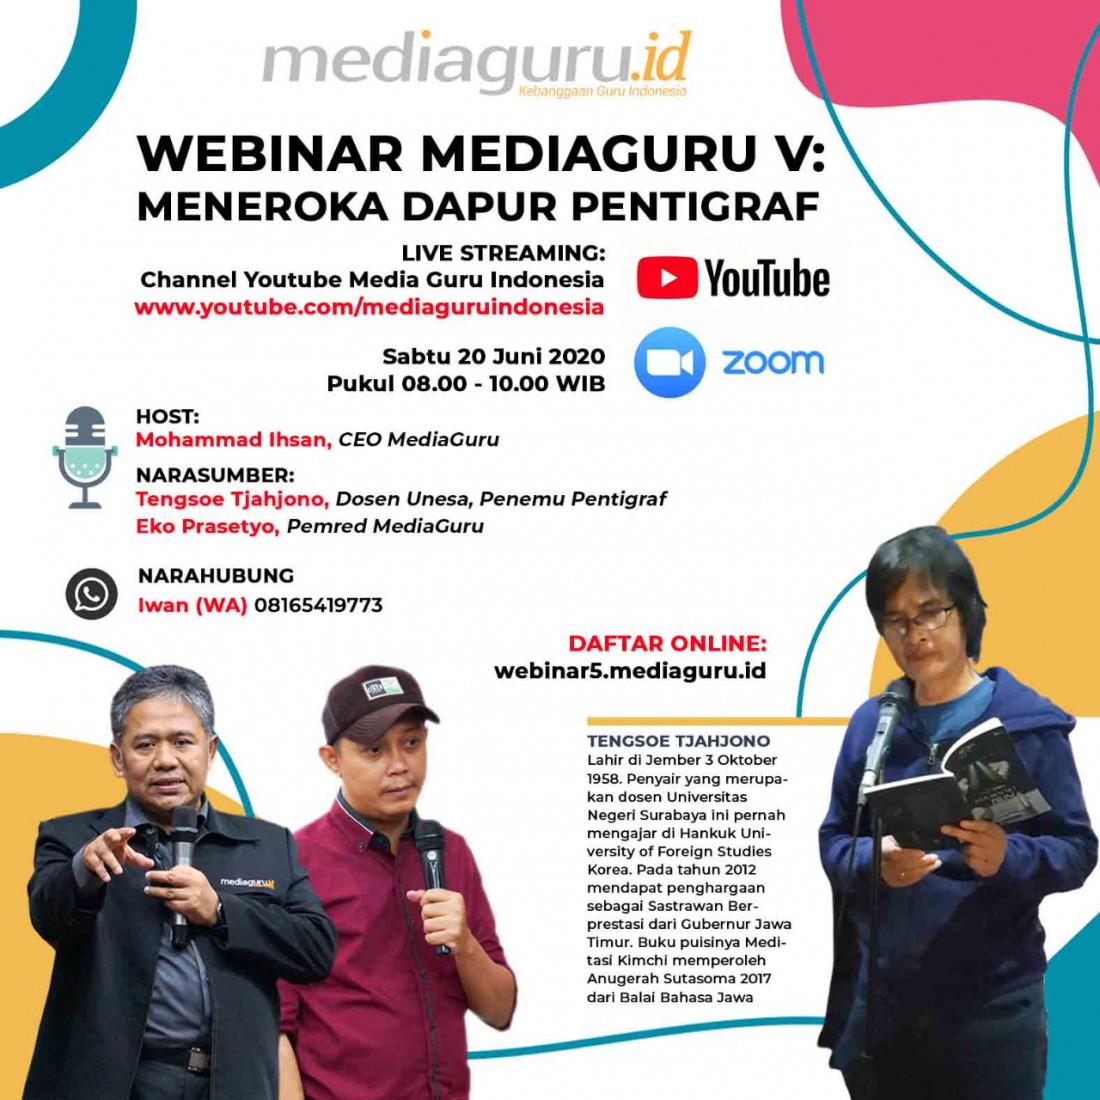 Webinar MediaGuru V - Meneroka Dapur Pentigraf (20 Juni 2020)